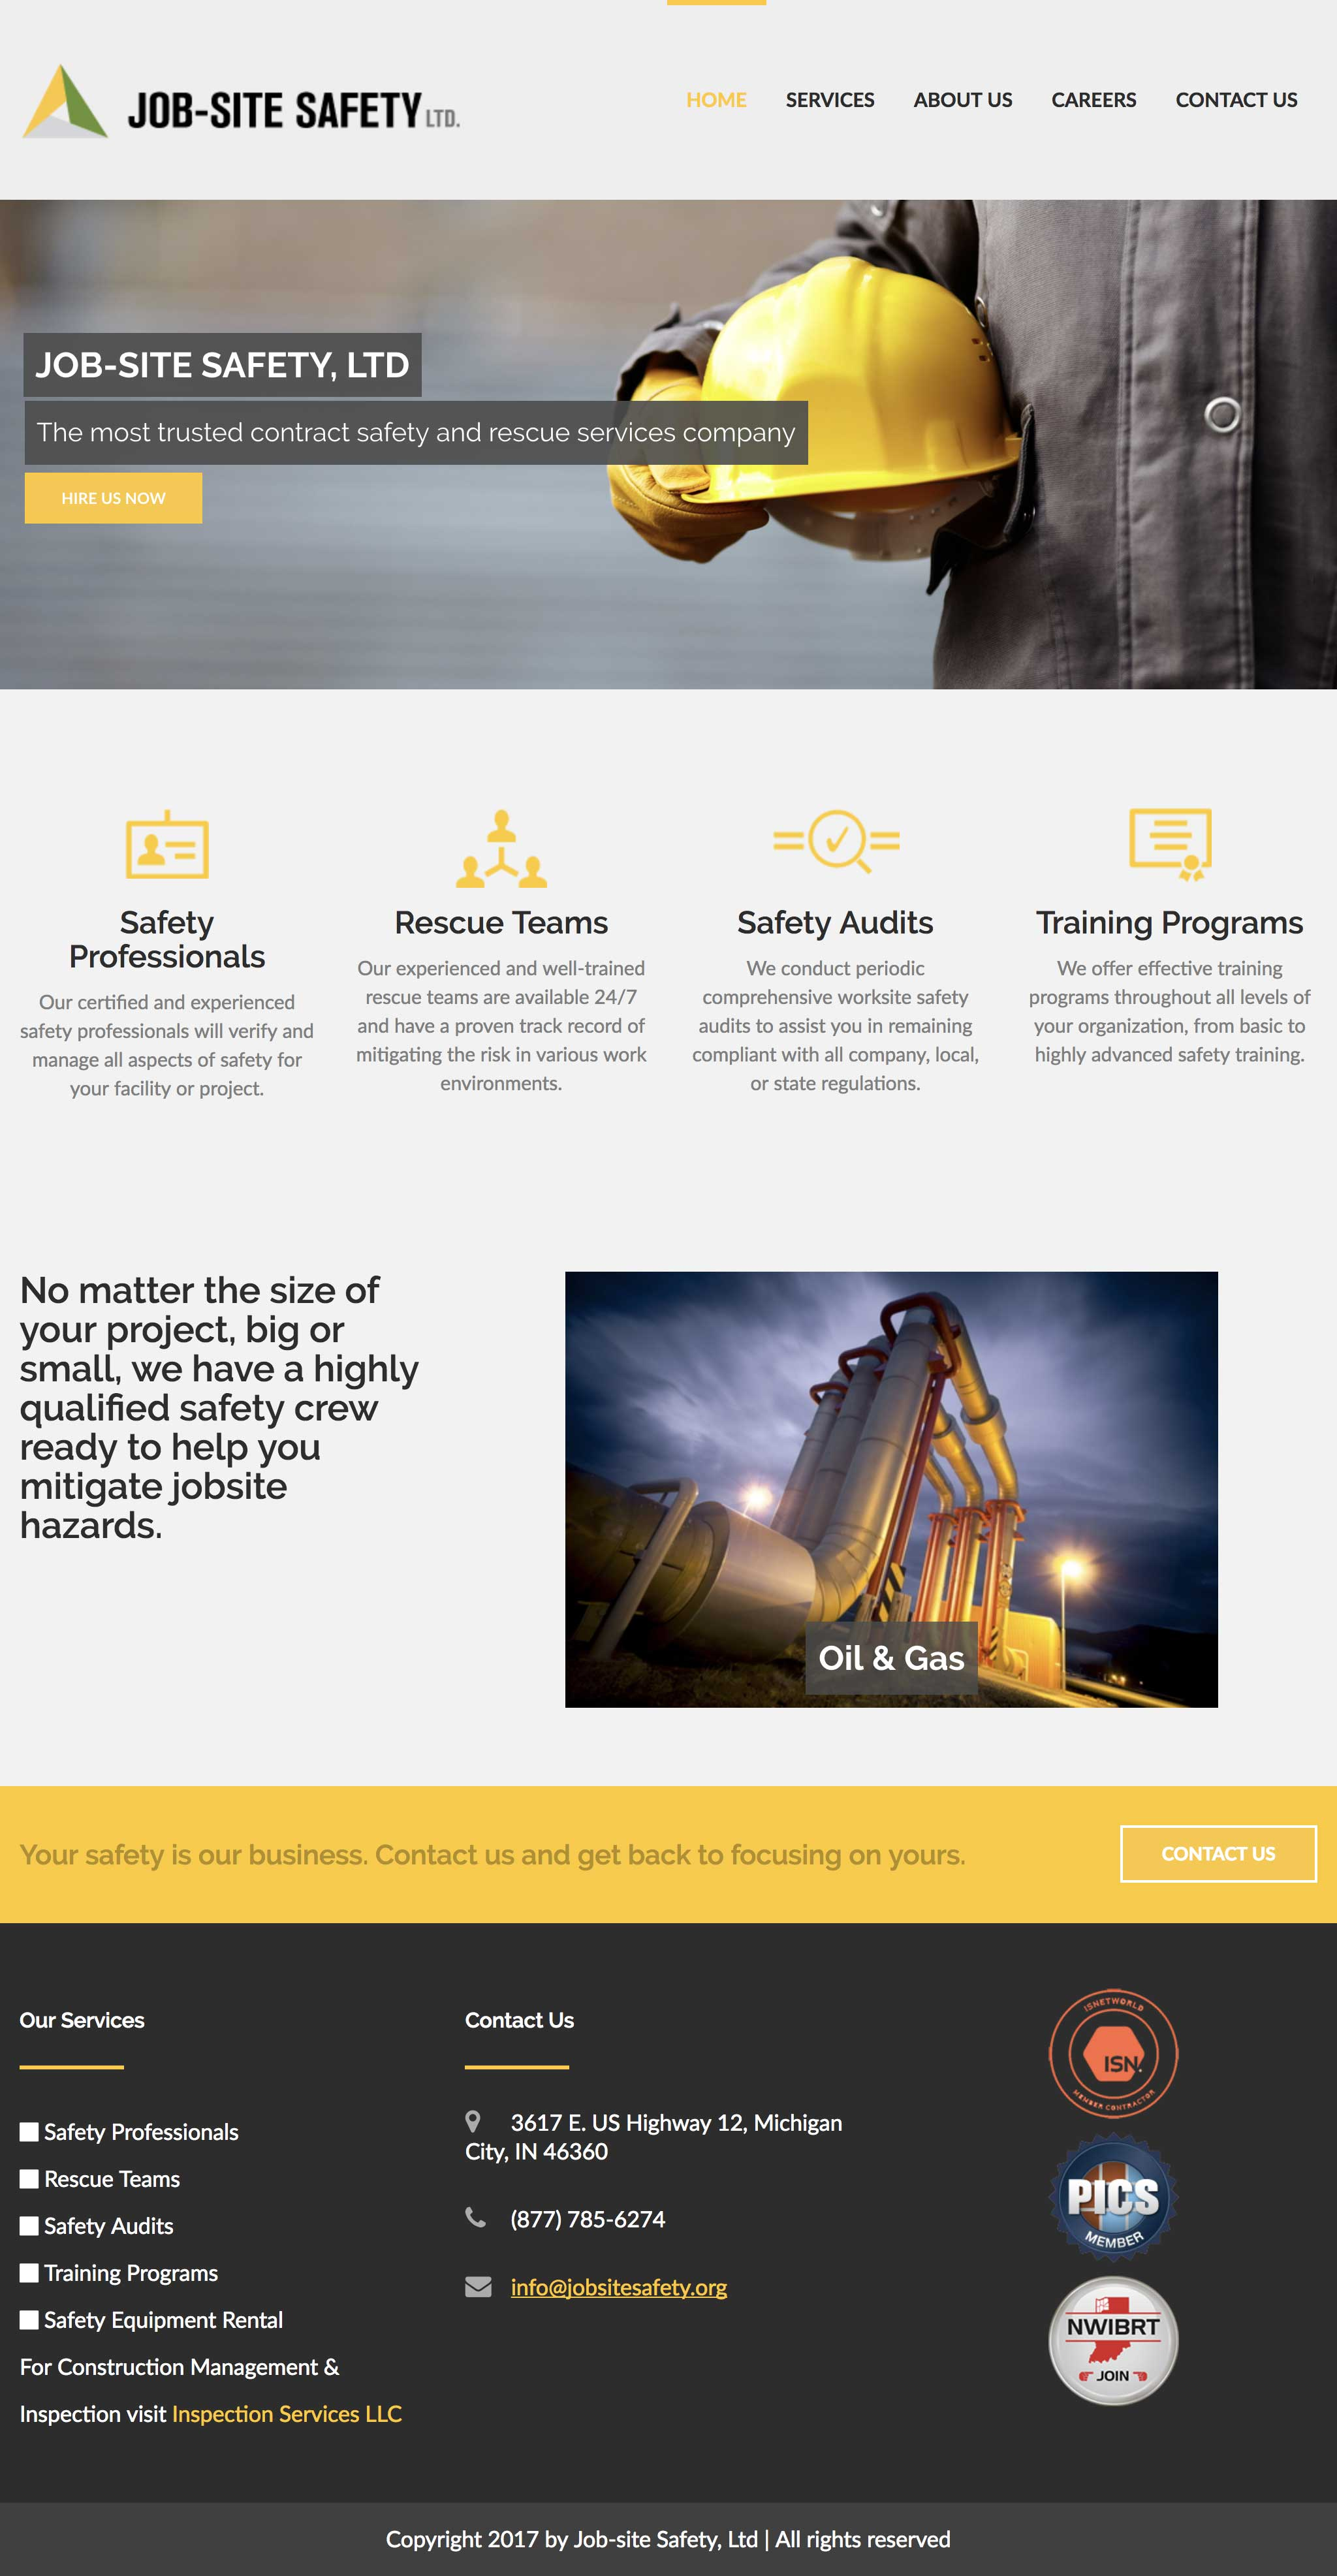 Job Site Safety's website